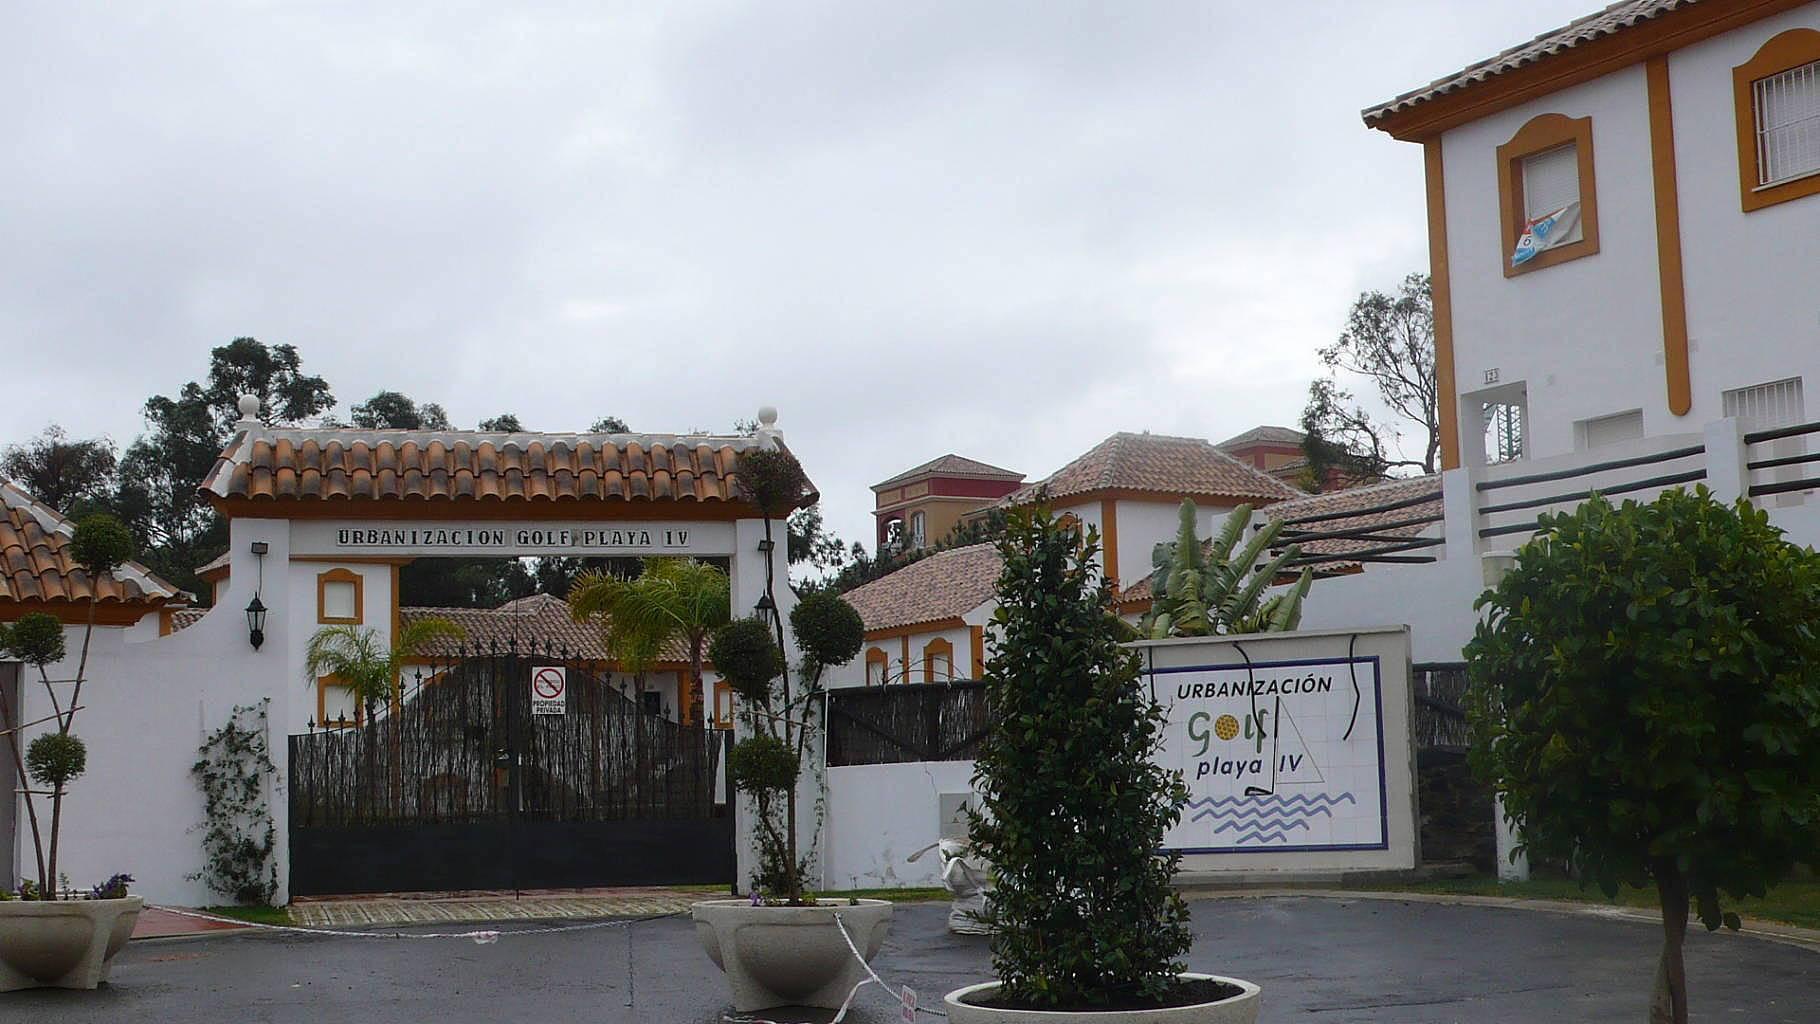 Casa para alugar a 500 m da praia islantilla i cristina - Rentalia islantilla ...